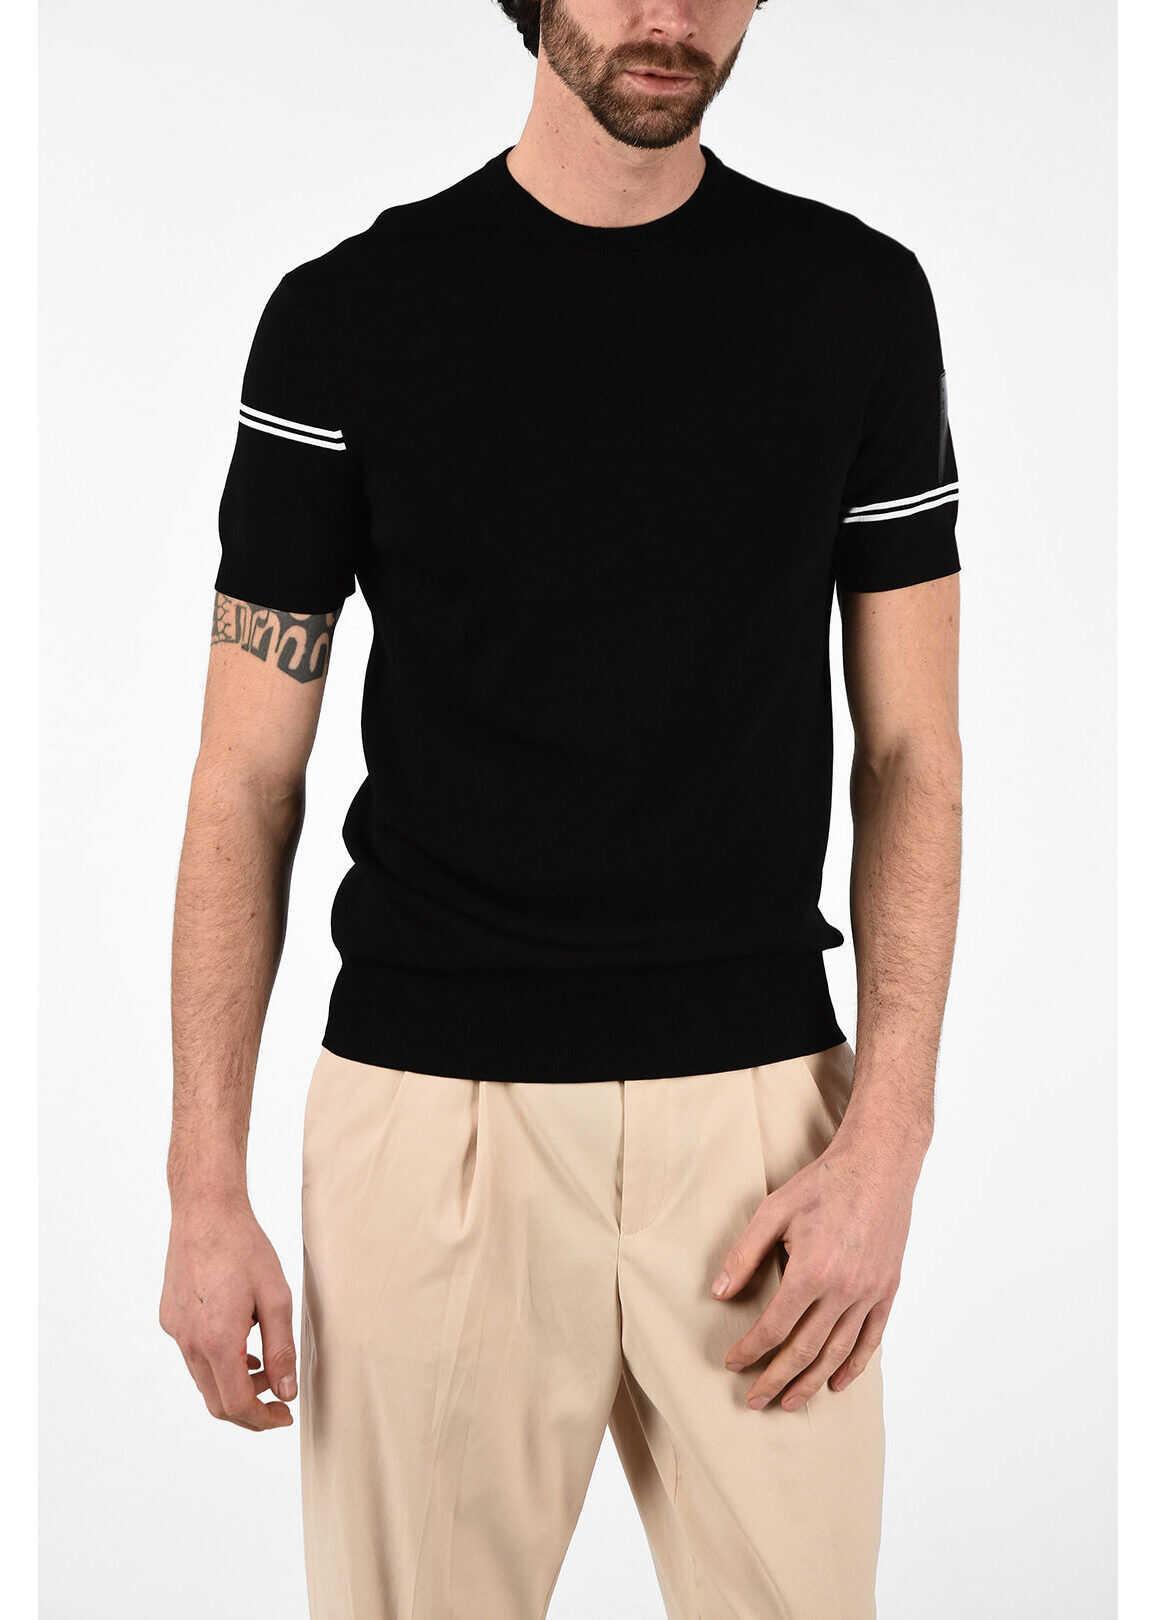 Neil Barrett Short Sleeve Slim Fit Sweater BLACK imagine